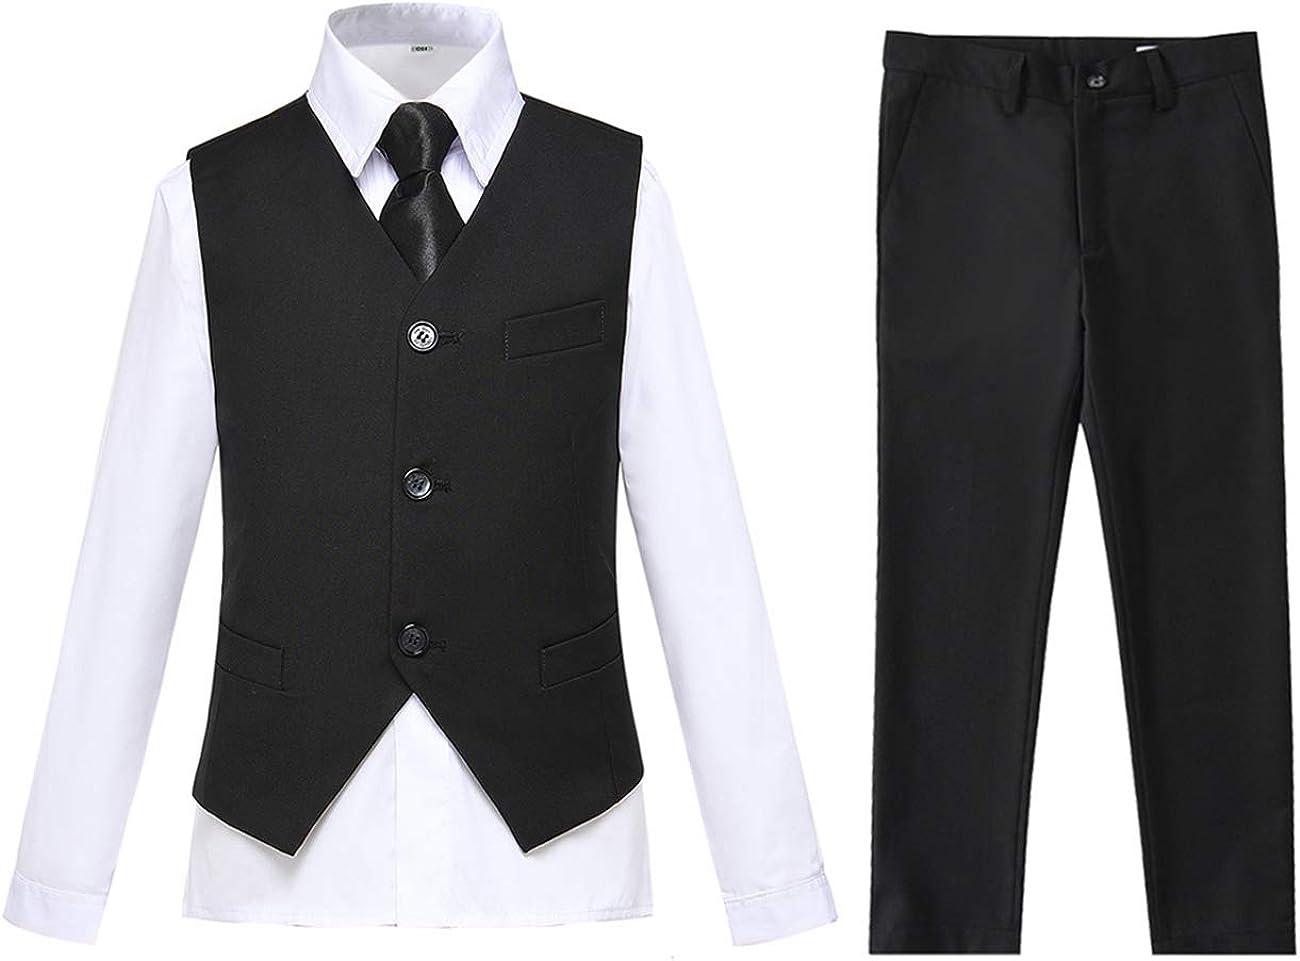 Gold Silver Waistcoat Wedding or Formal Wear Boys /& Mens Sizes Stock 003